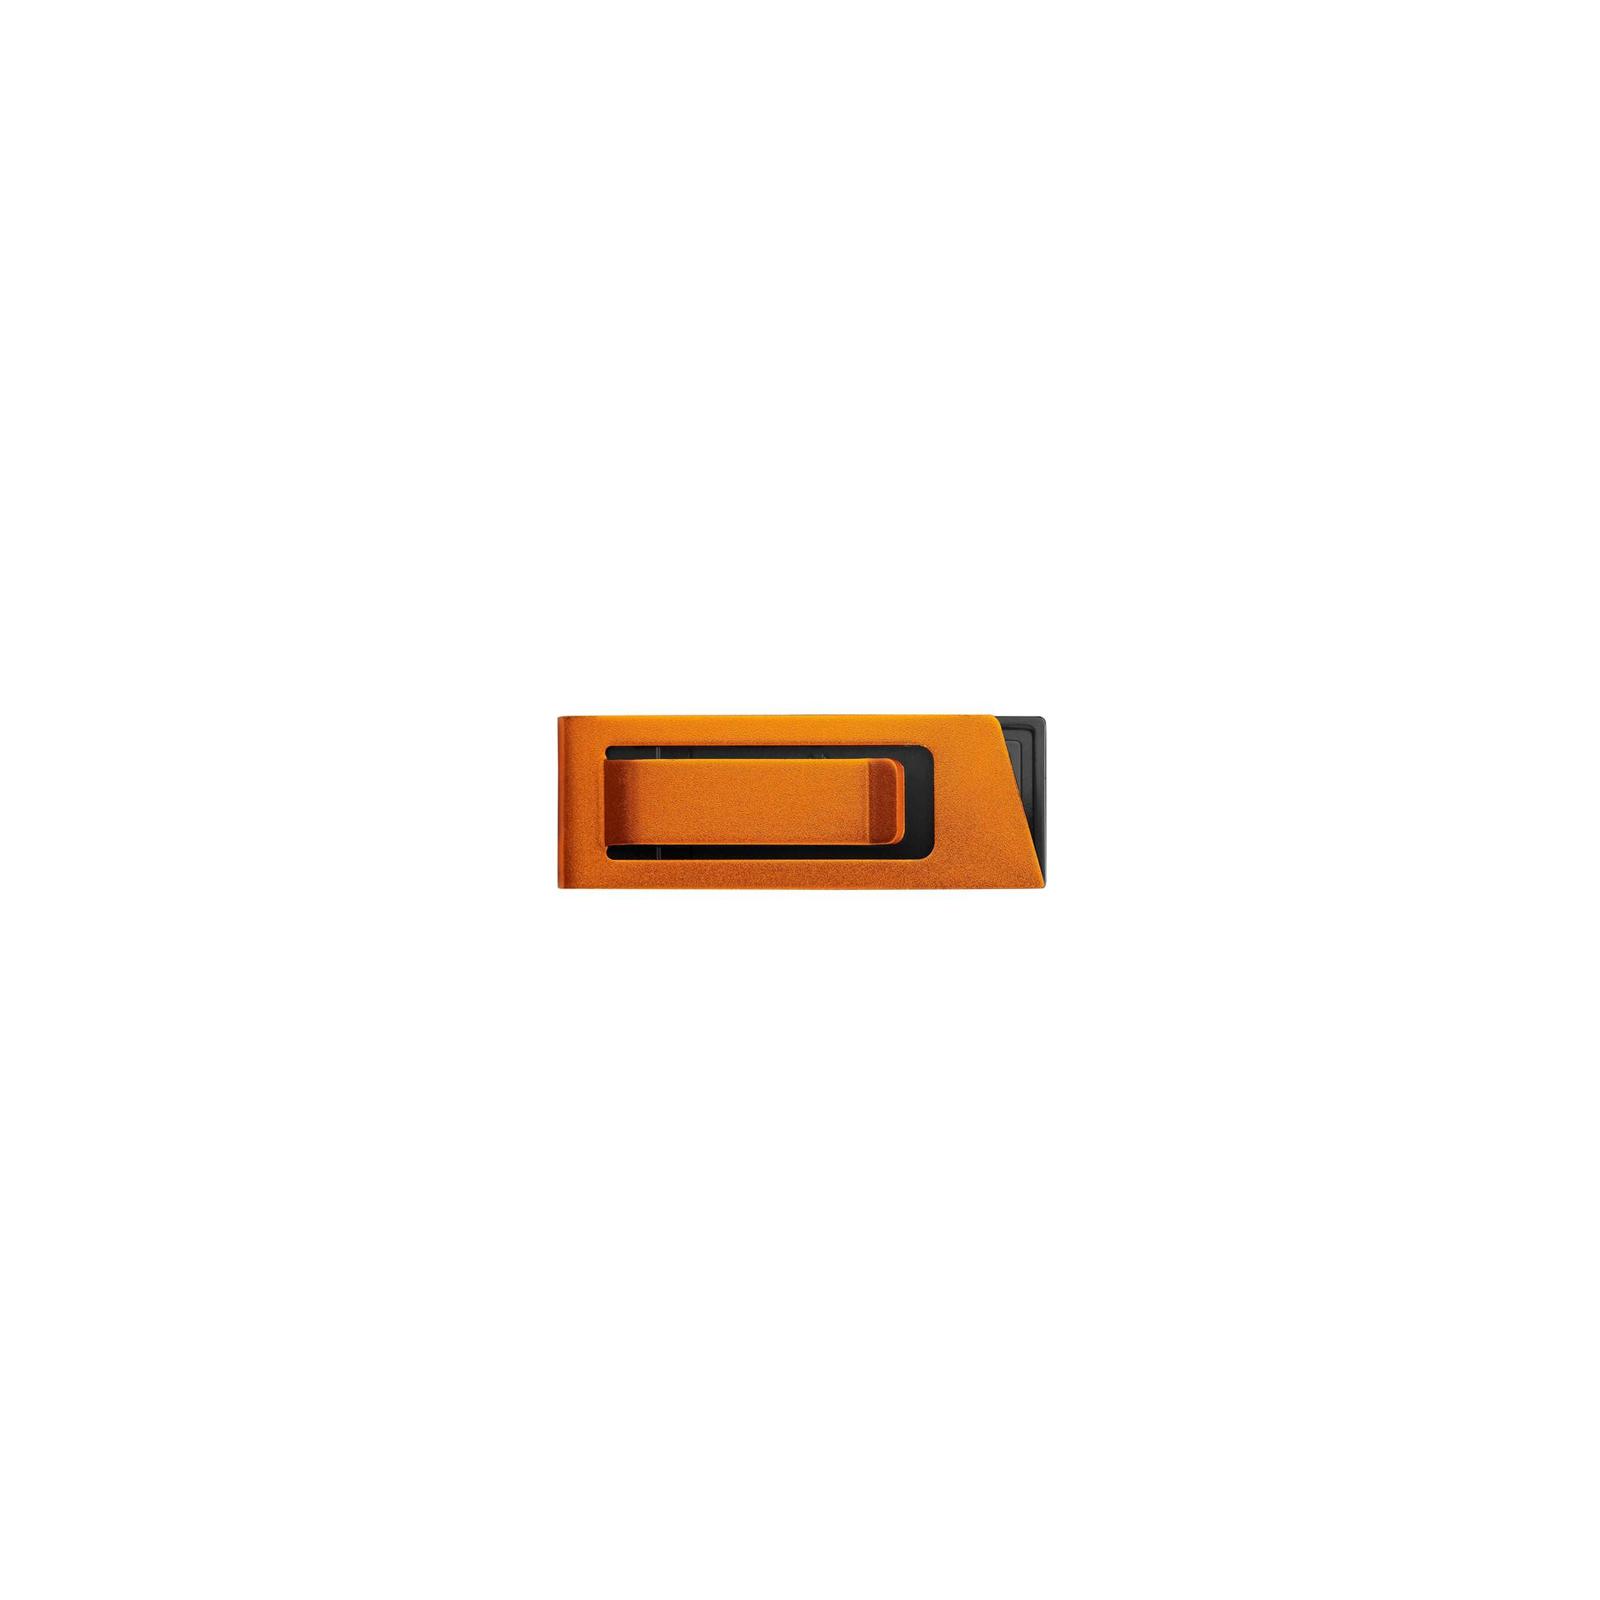 USB флеш накопитель 16GB AH130 Orange RP USB2.0 Apacer (AP16GAH130T-1) изображение 2